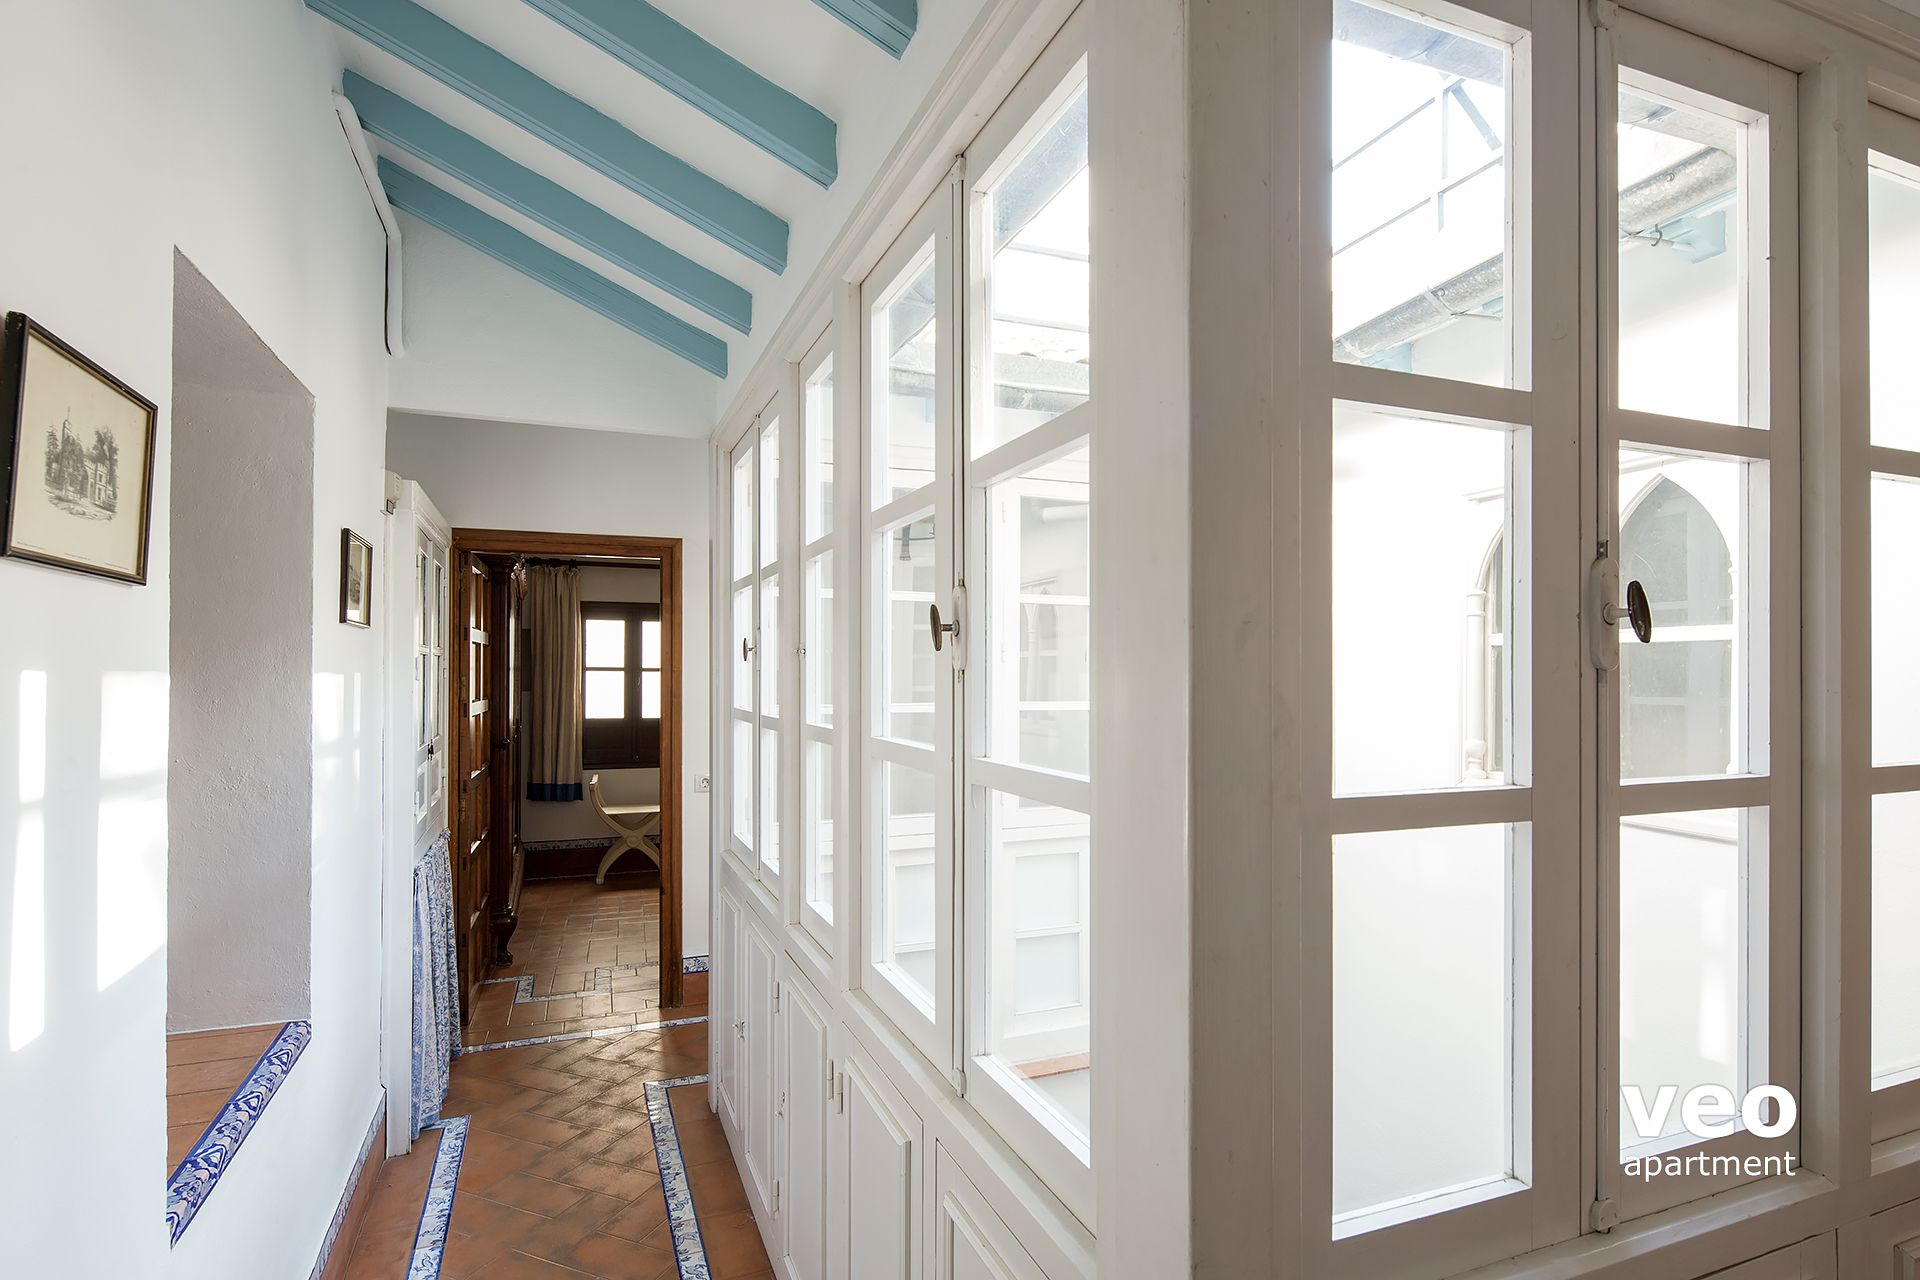 Casa 28 rueil malmaison seville apartment view towards for Appart hotel seville